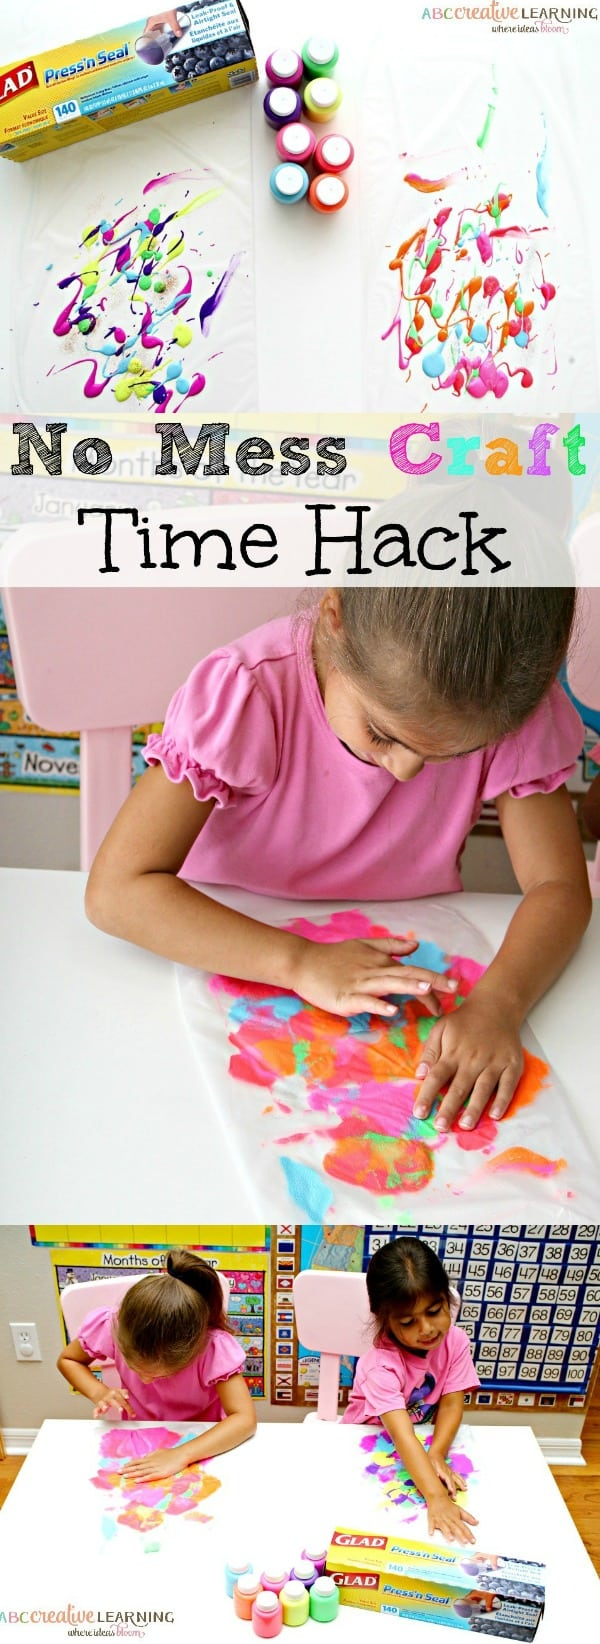 No Mess Craft Time Hacks For Parents